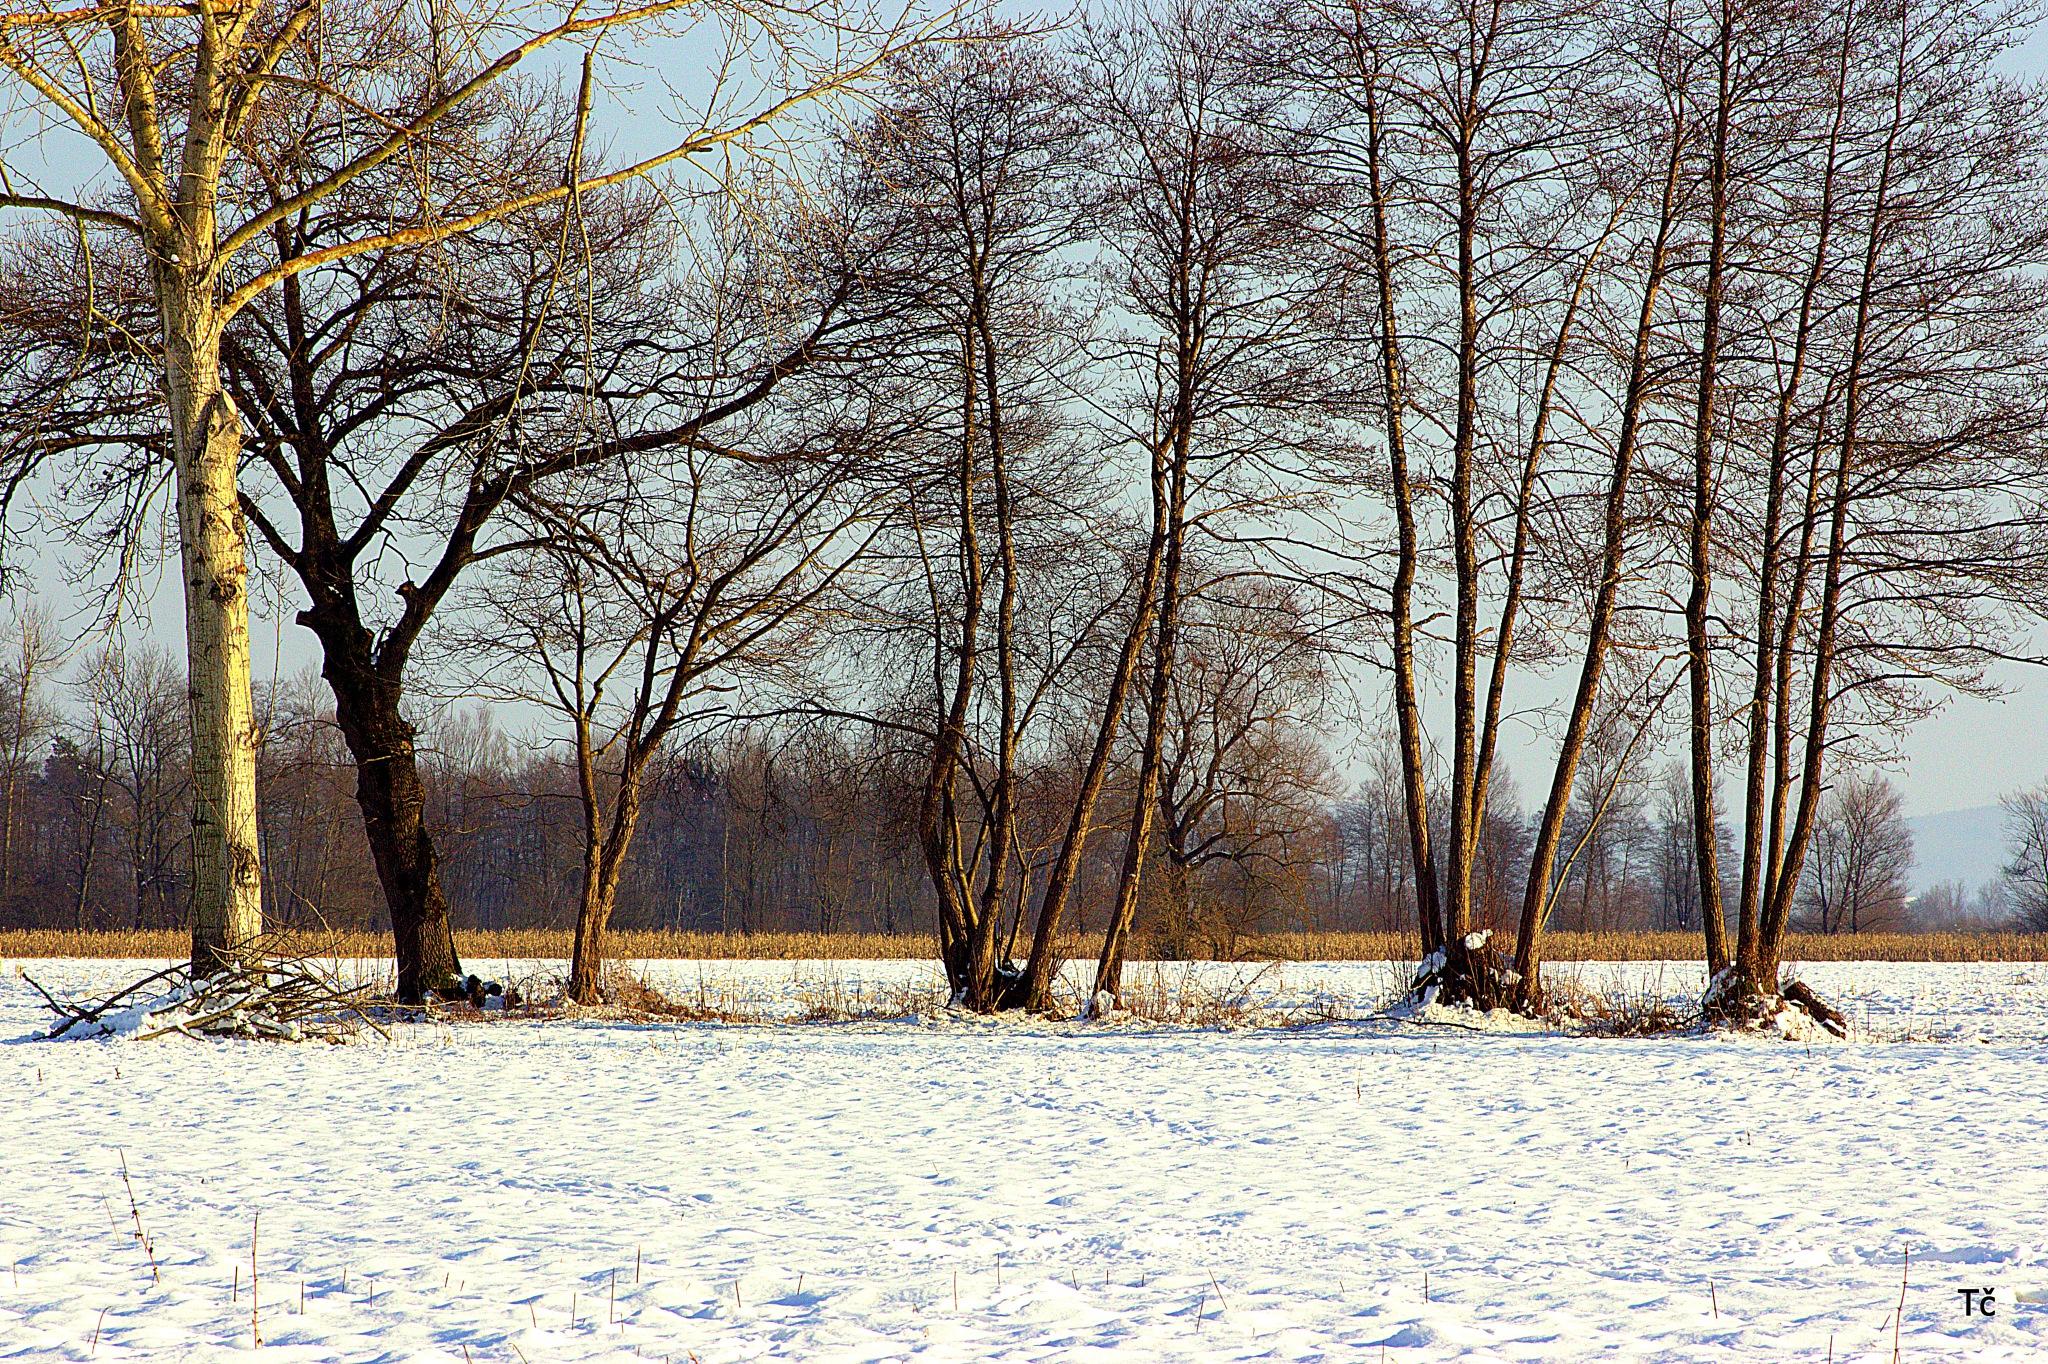 Ljubljana Marshes in a beautiful winter day by leopold.brzin